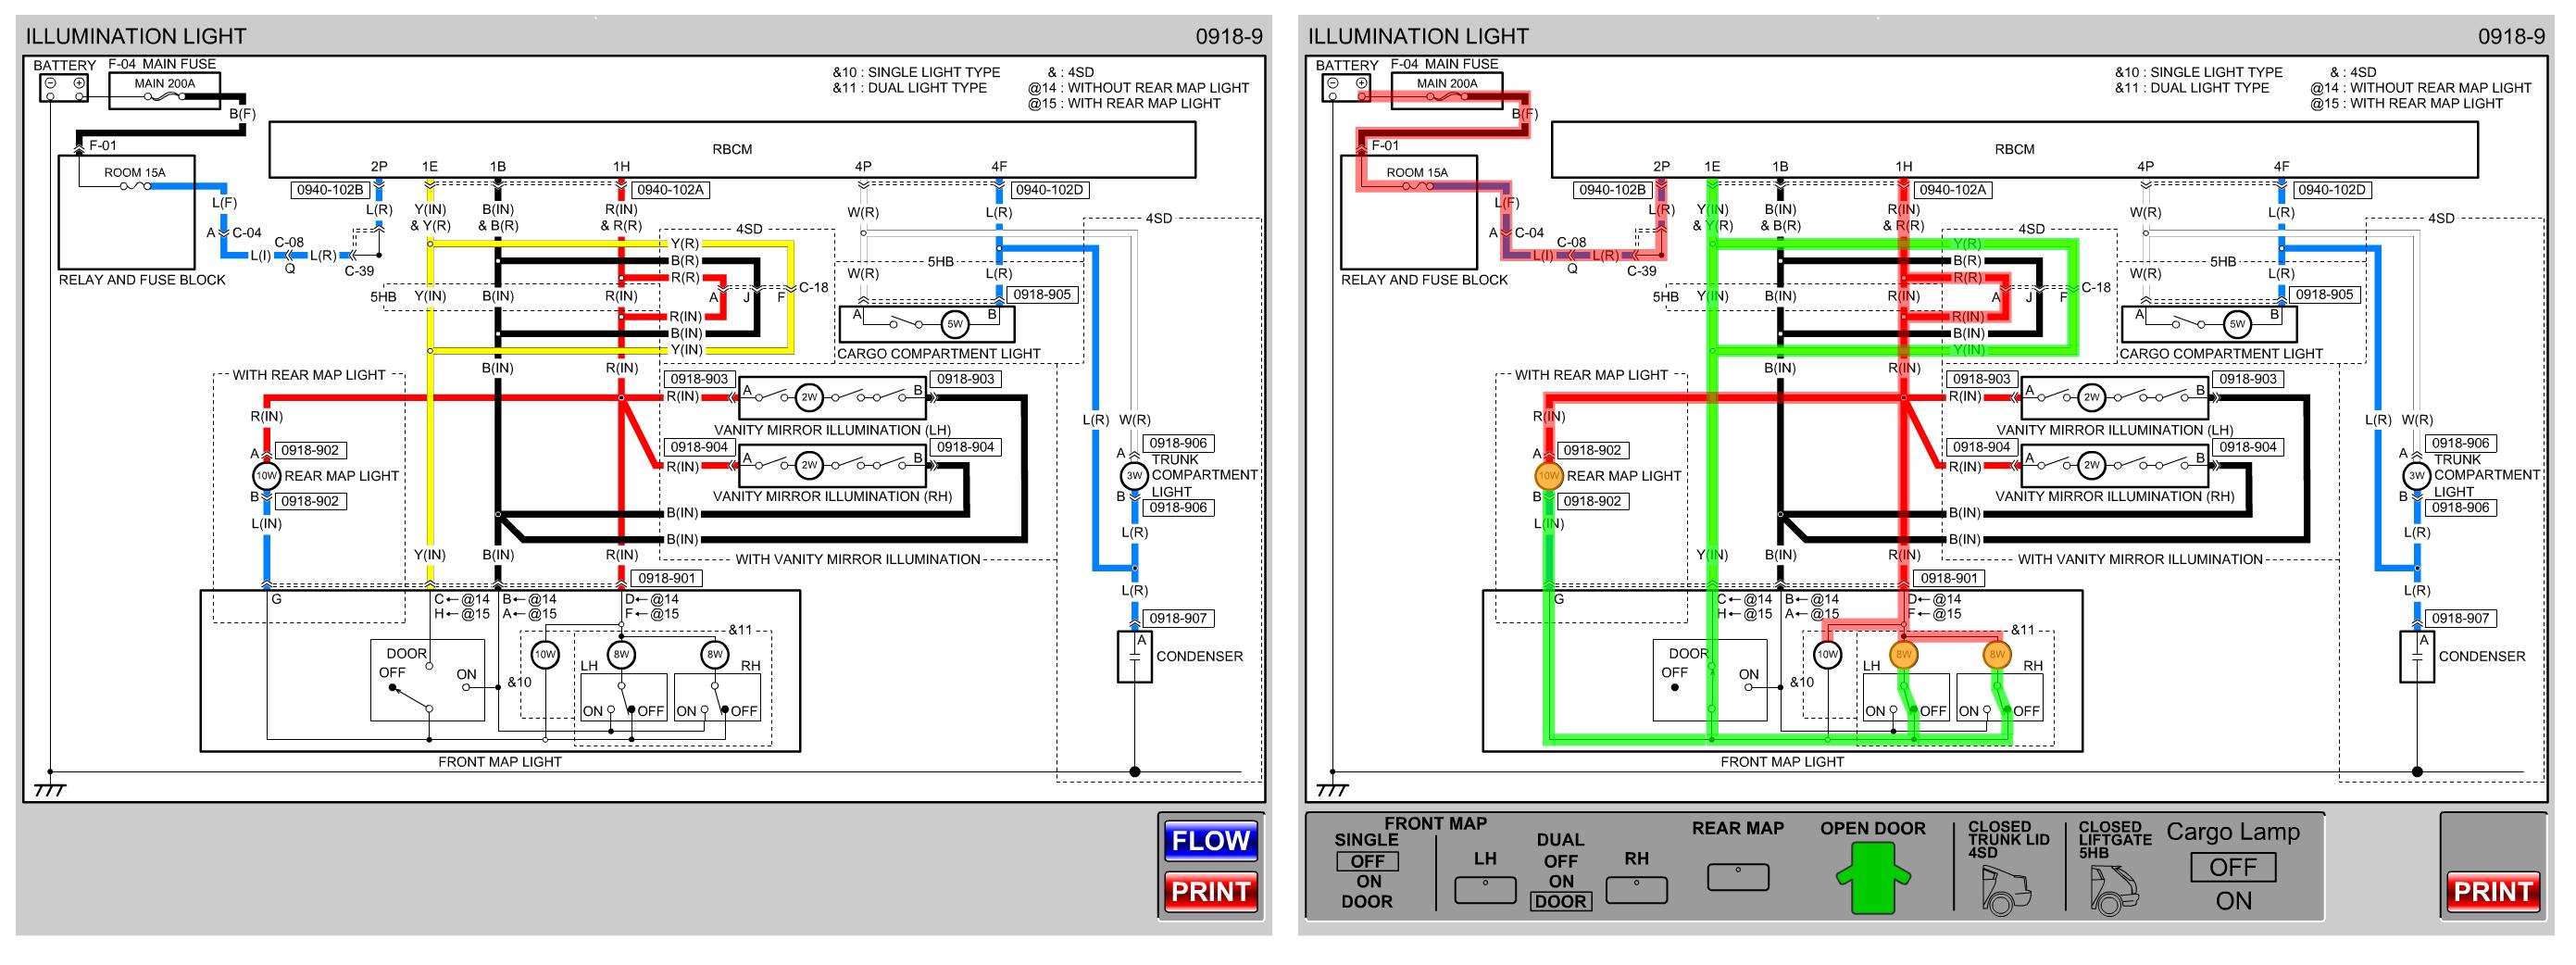 Superb 2010 Mazda 3 Fog Light Wiring Diagram Data Wiring Diagram Wiring Cloud Rdonaheevemohammedshrineorg